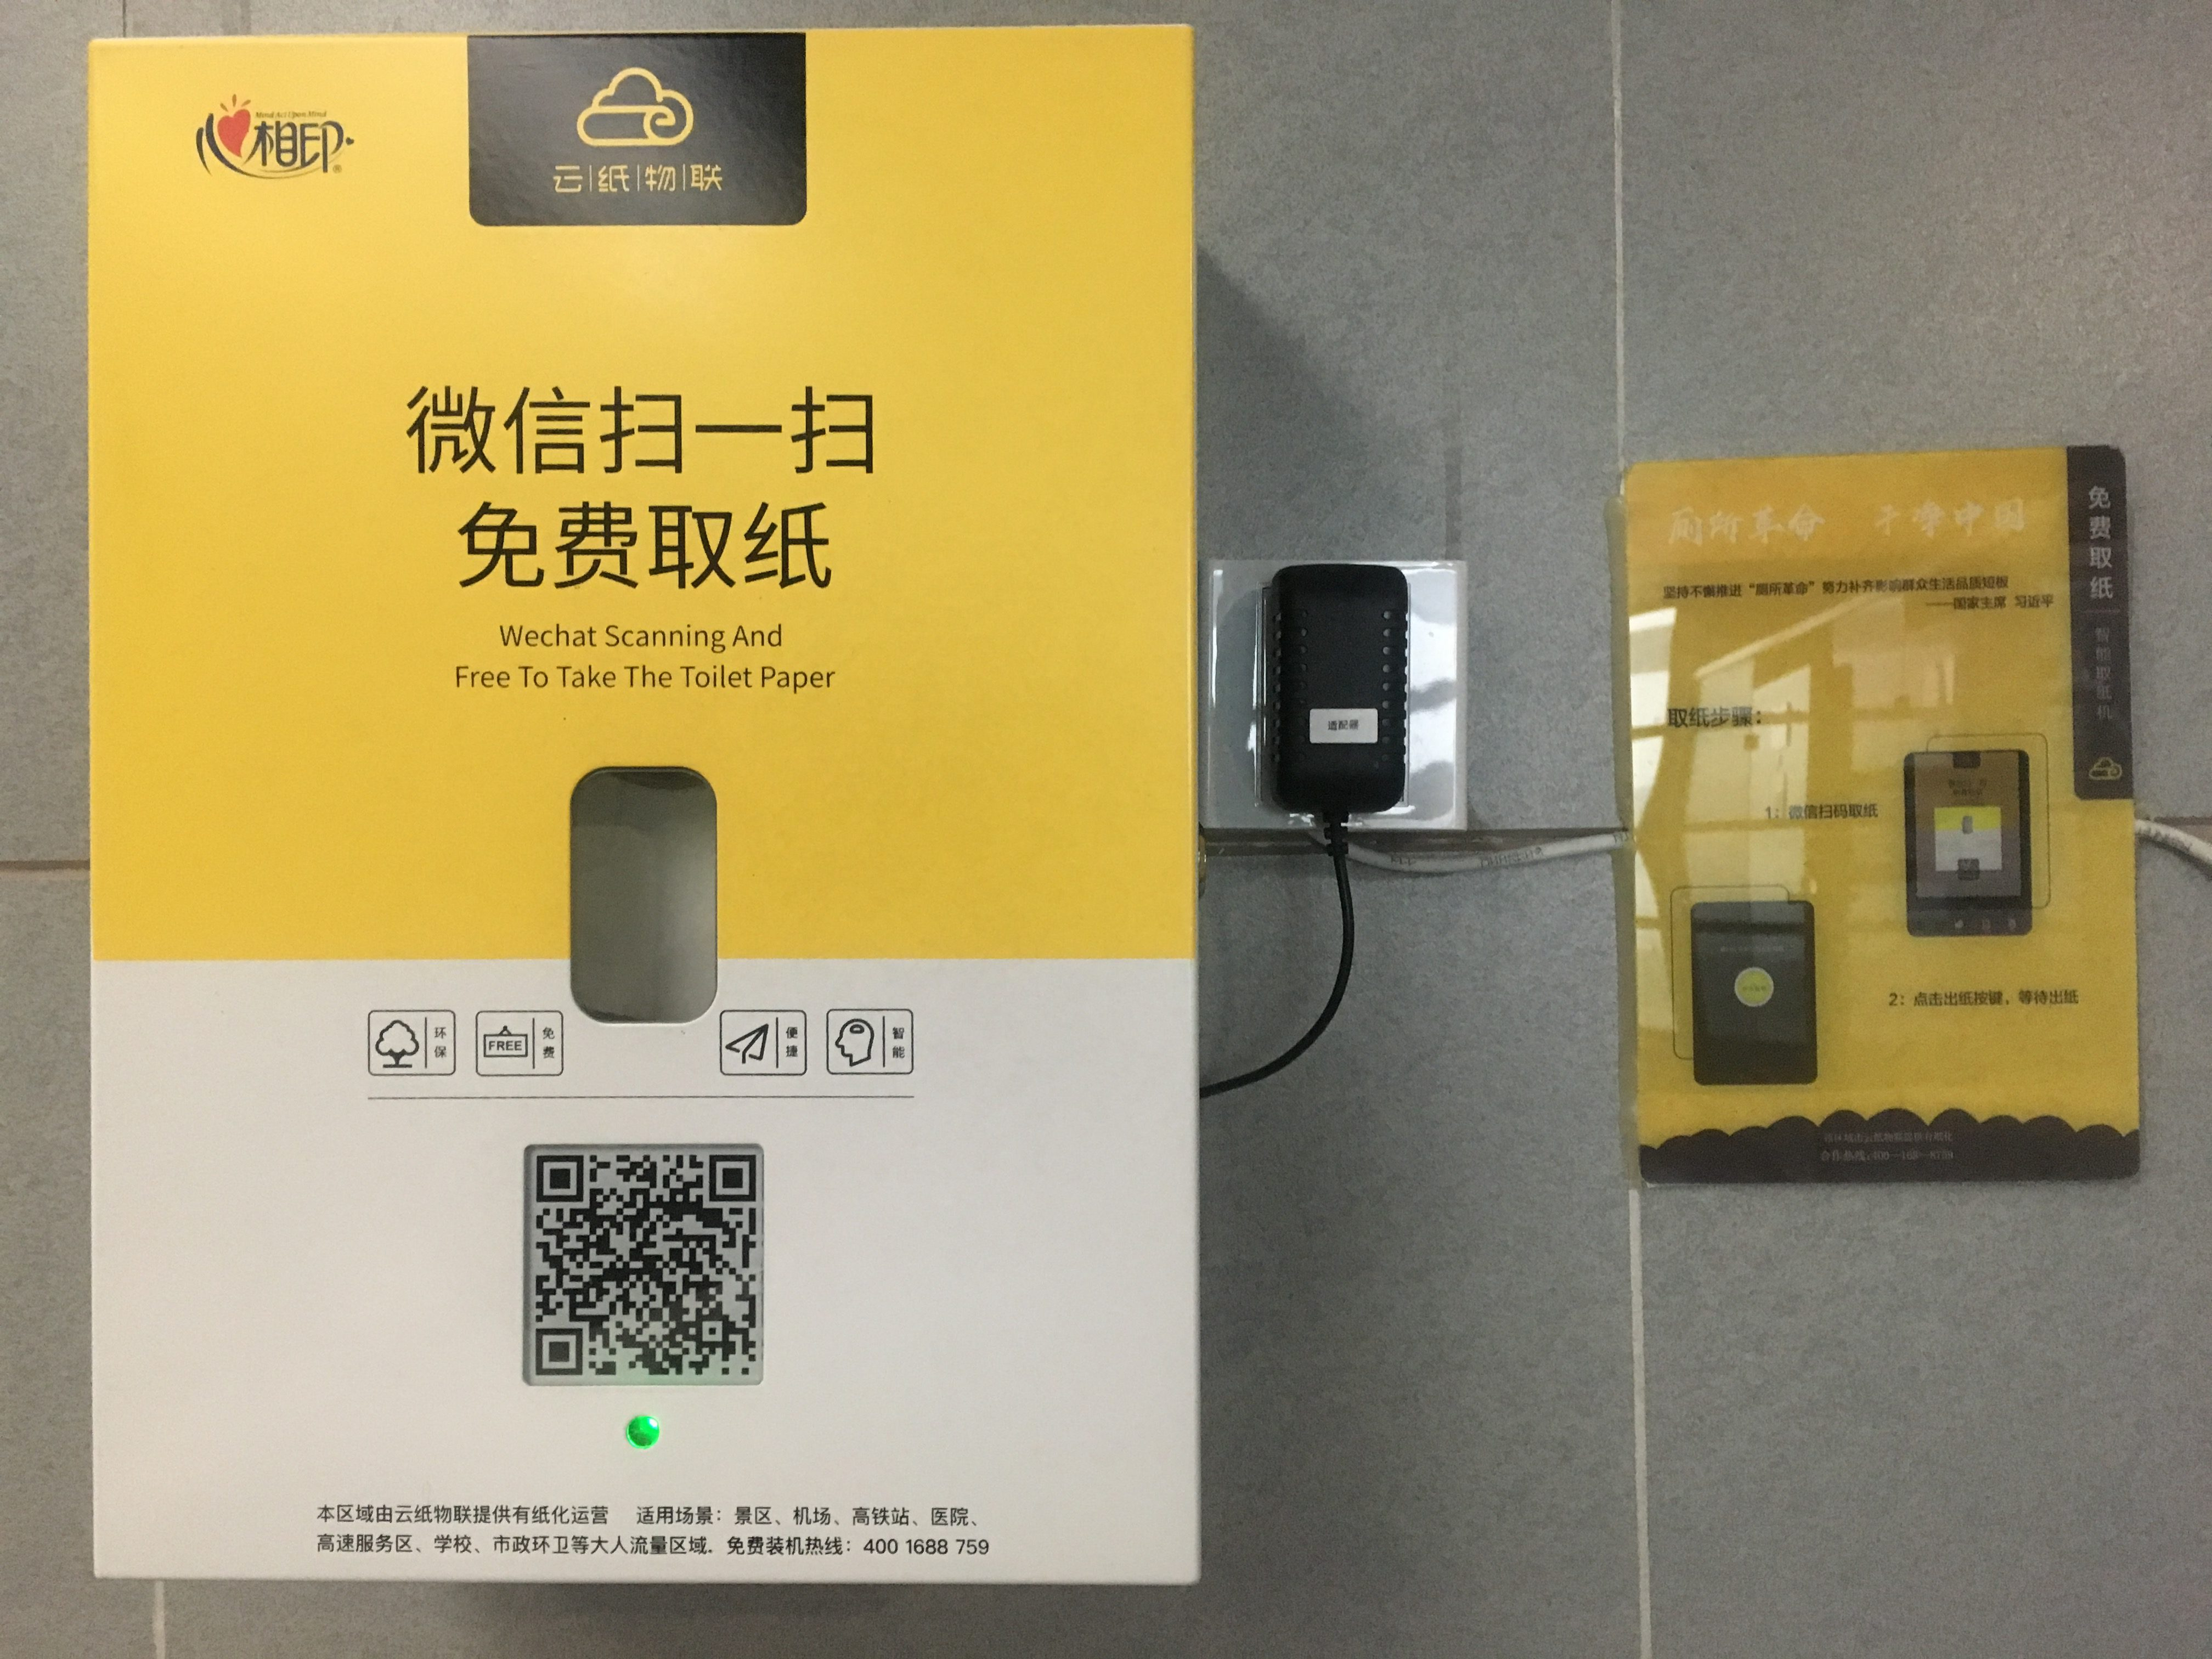 Toilet paper vending machine Ningbo Railway Station